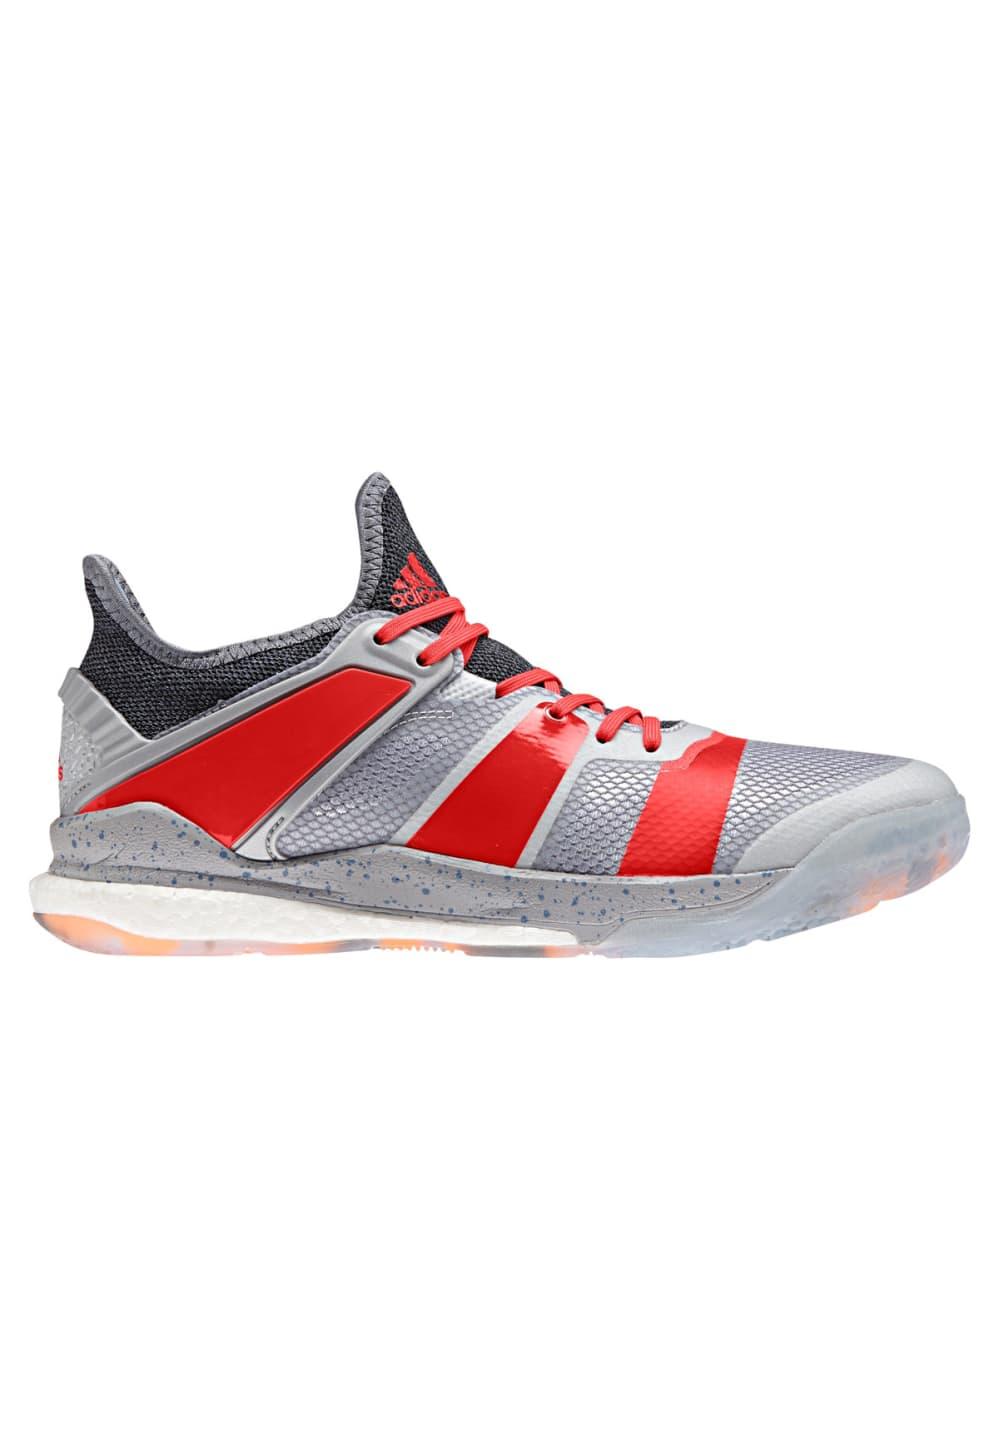 best service 8d1e3 75078 adidas Stabil X - Handball shoes for Men - Silver